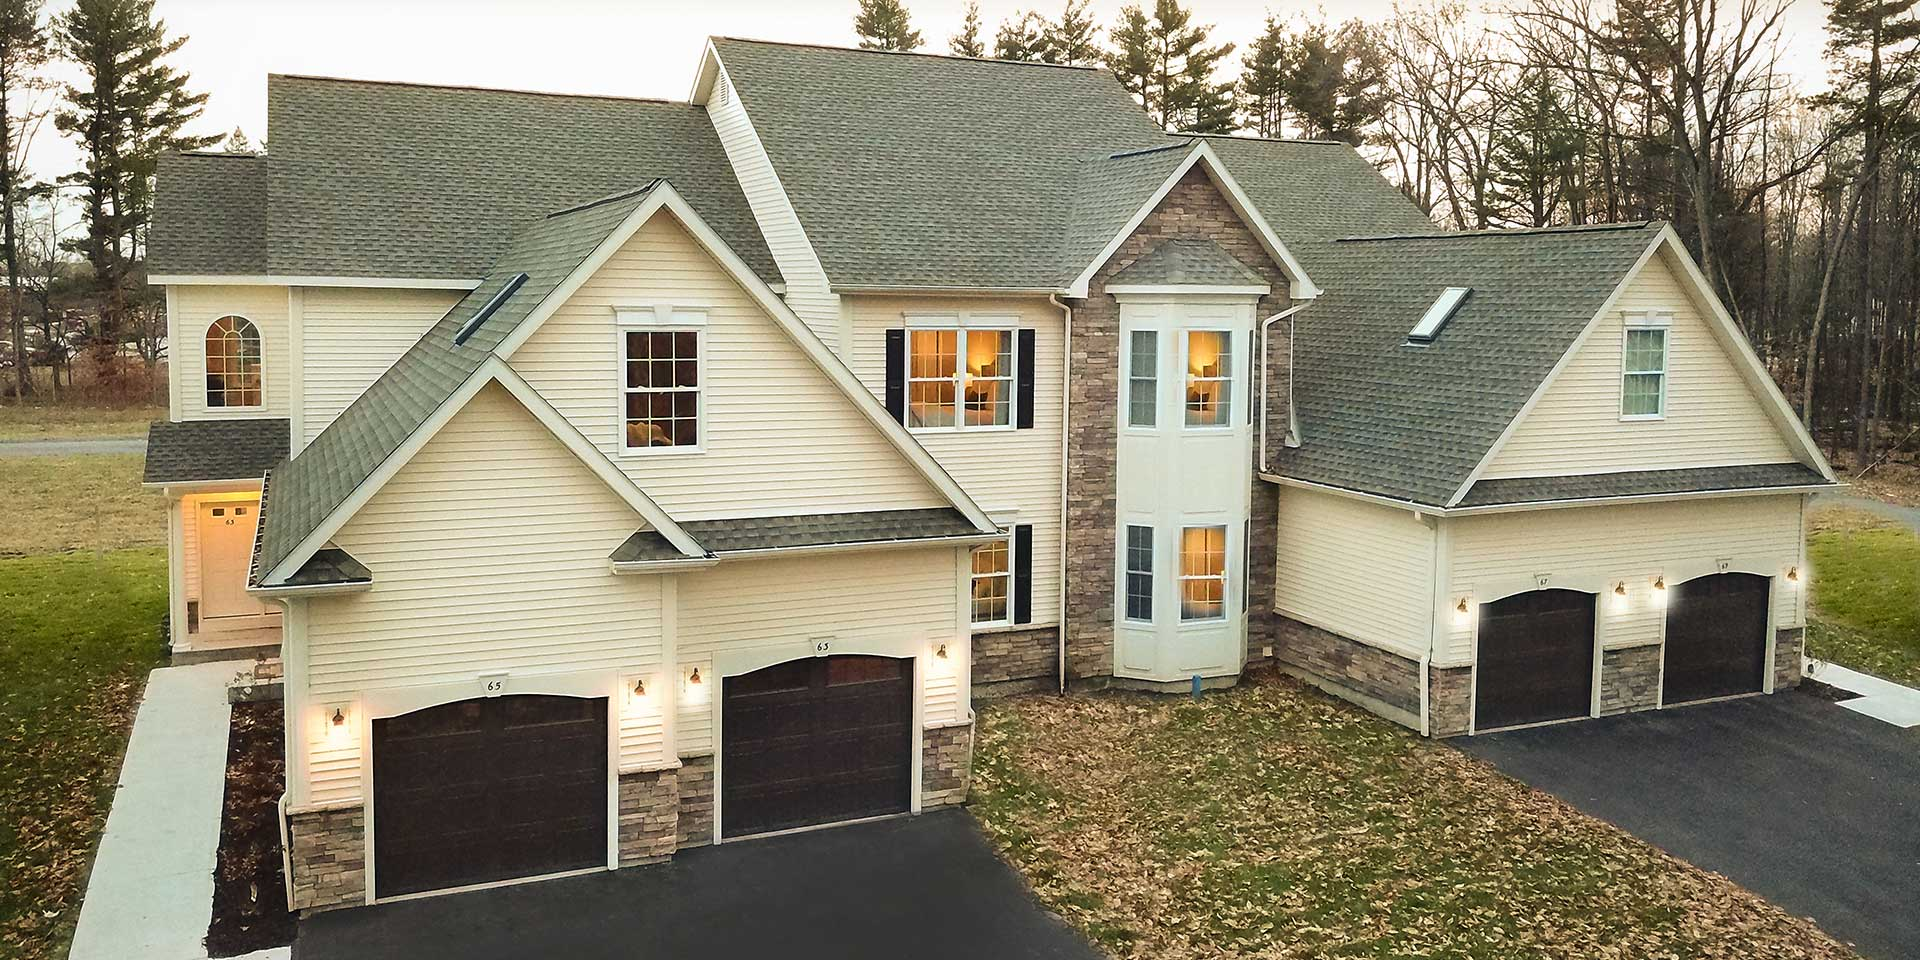 2019 Showcase home #1 by BDC Group: a condo located at 53 Cornerstone Drive in Ballston Spa, NY